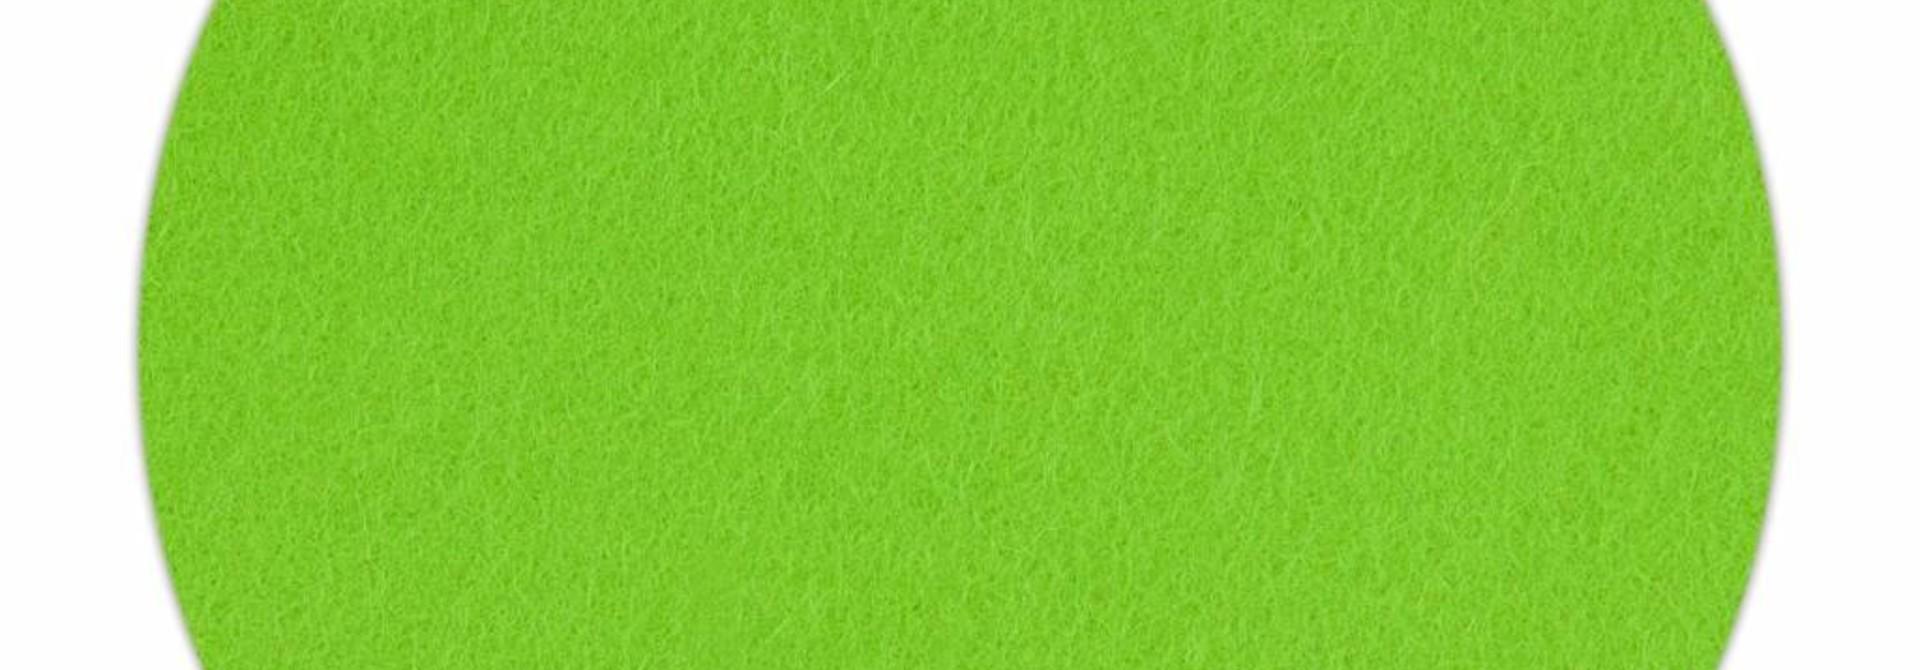 HomePod & HomePod mini felt coaster Bright-Green